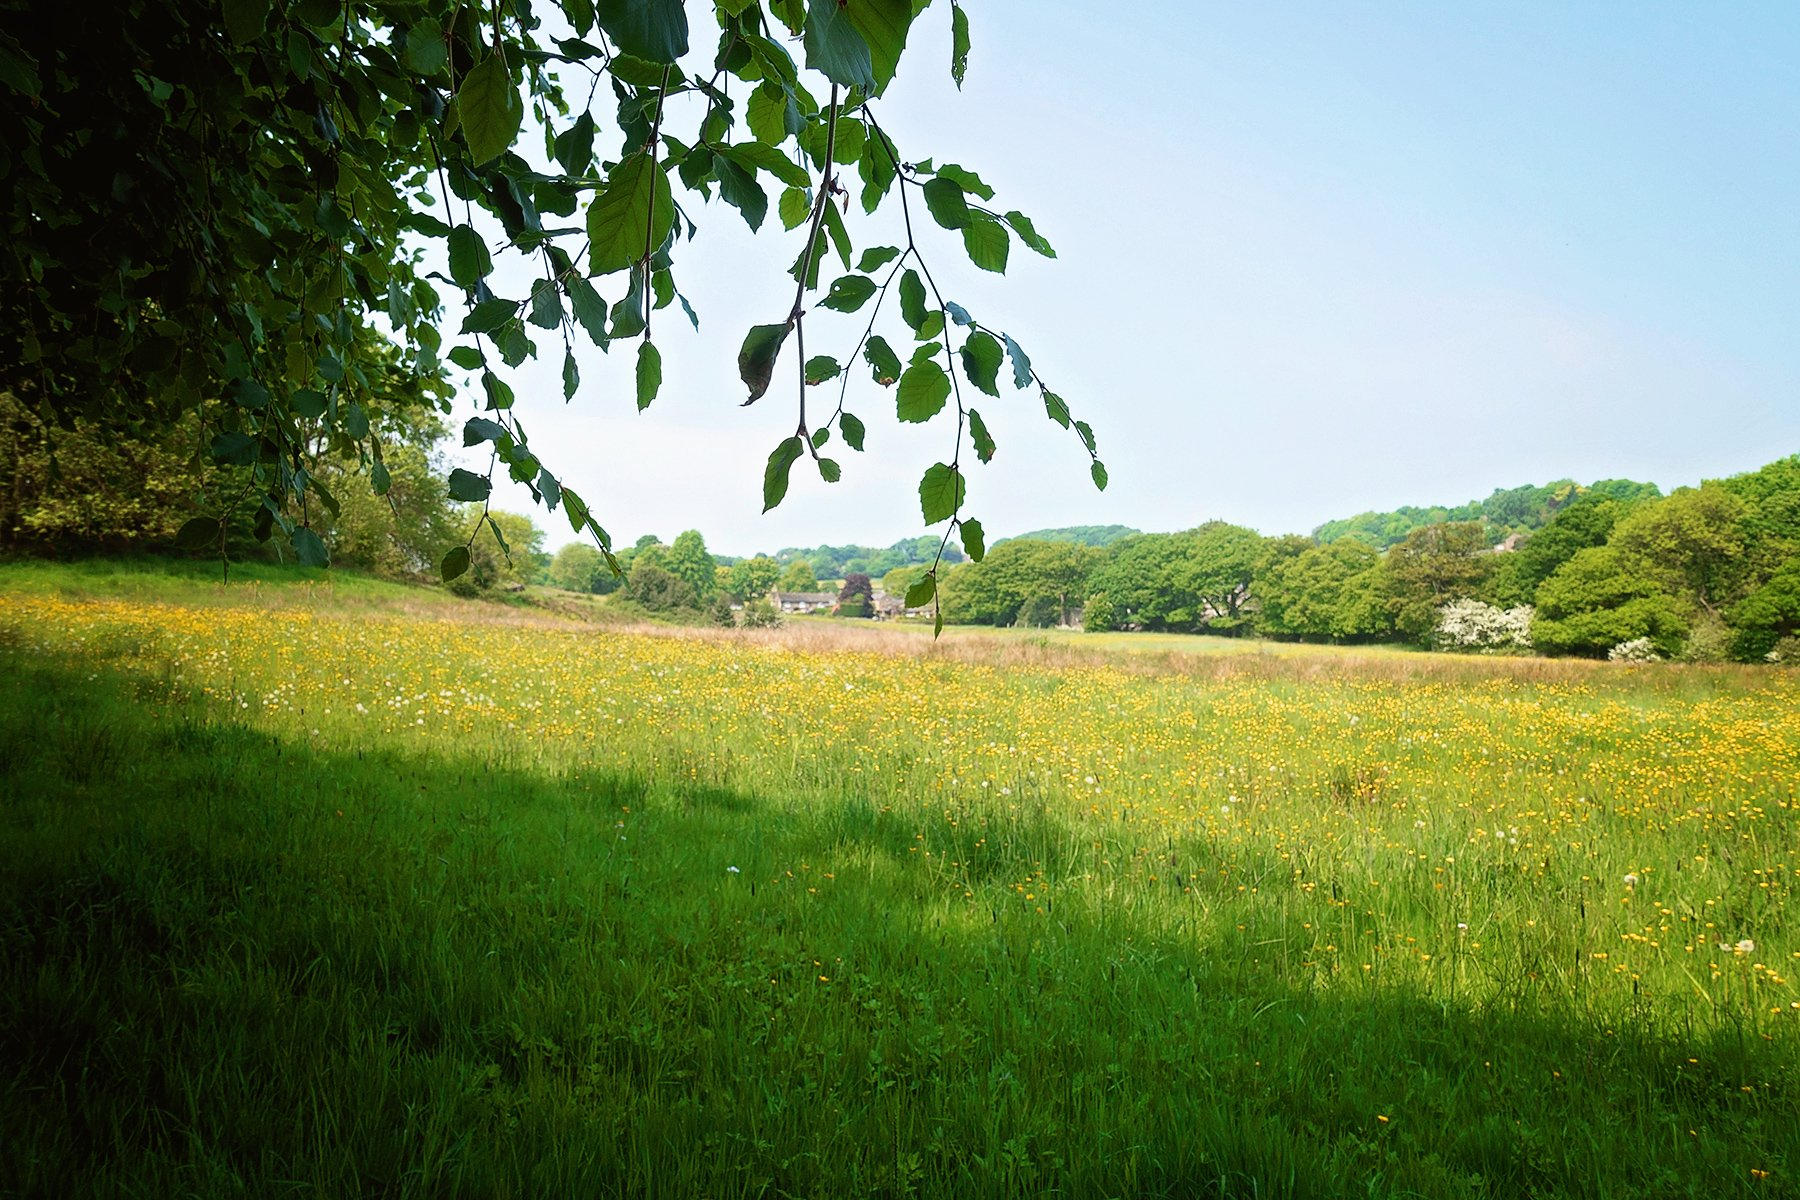 Mayfield Valley in Sheffield